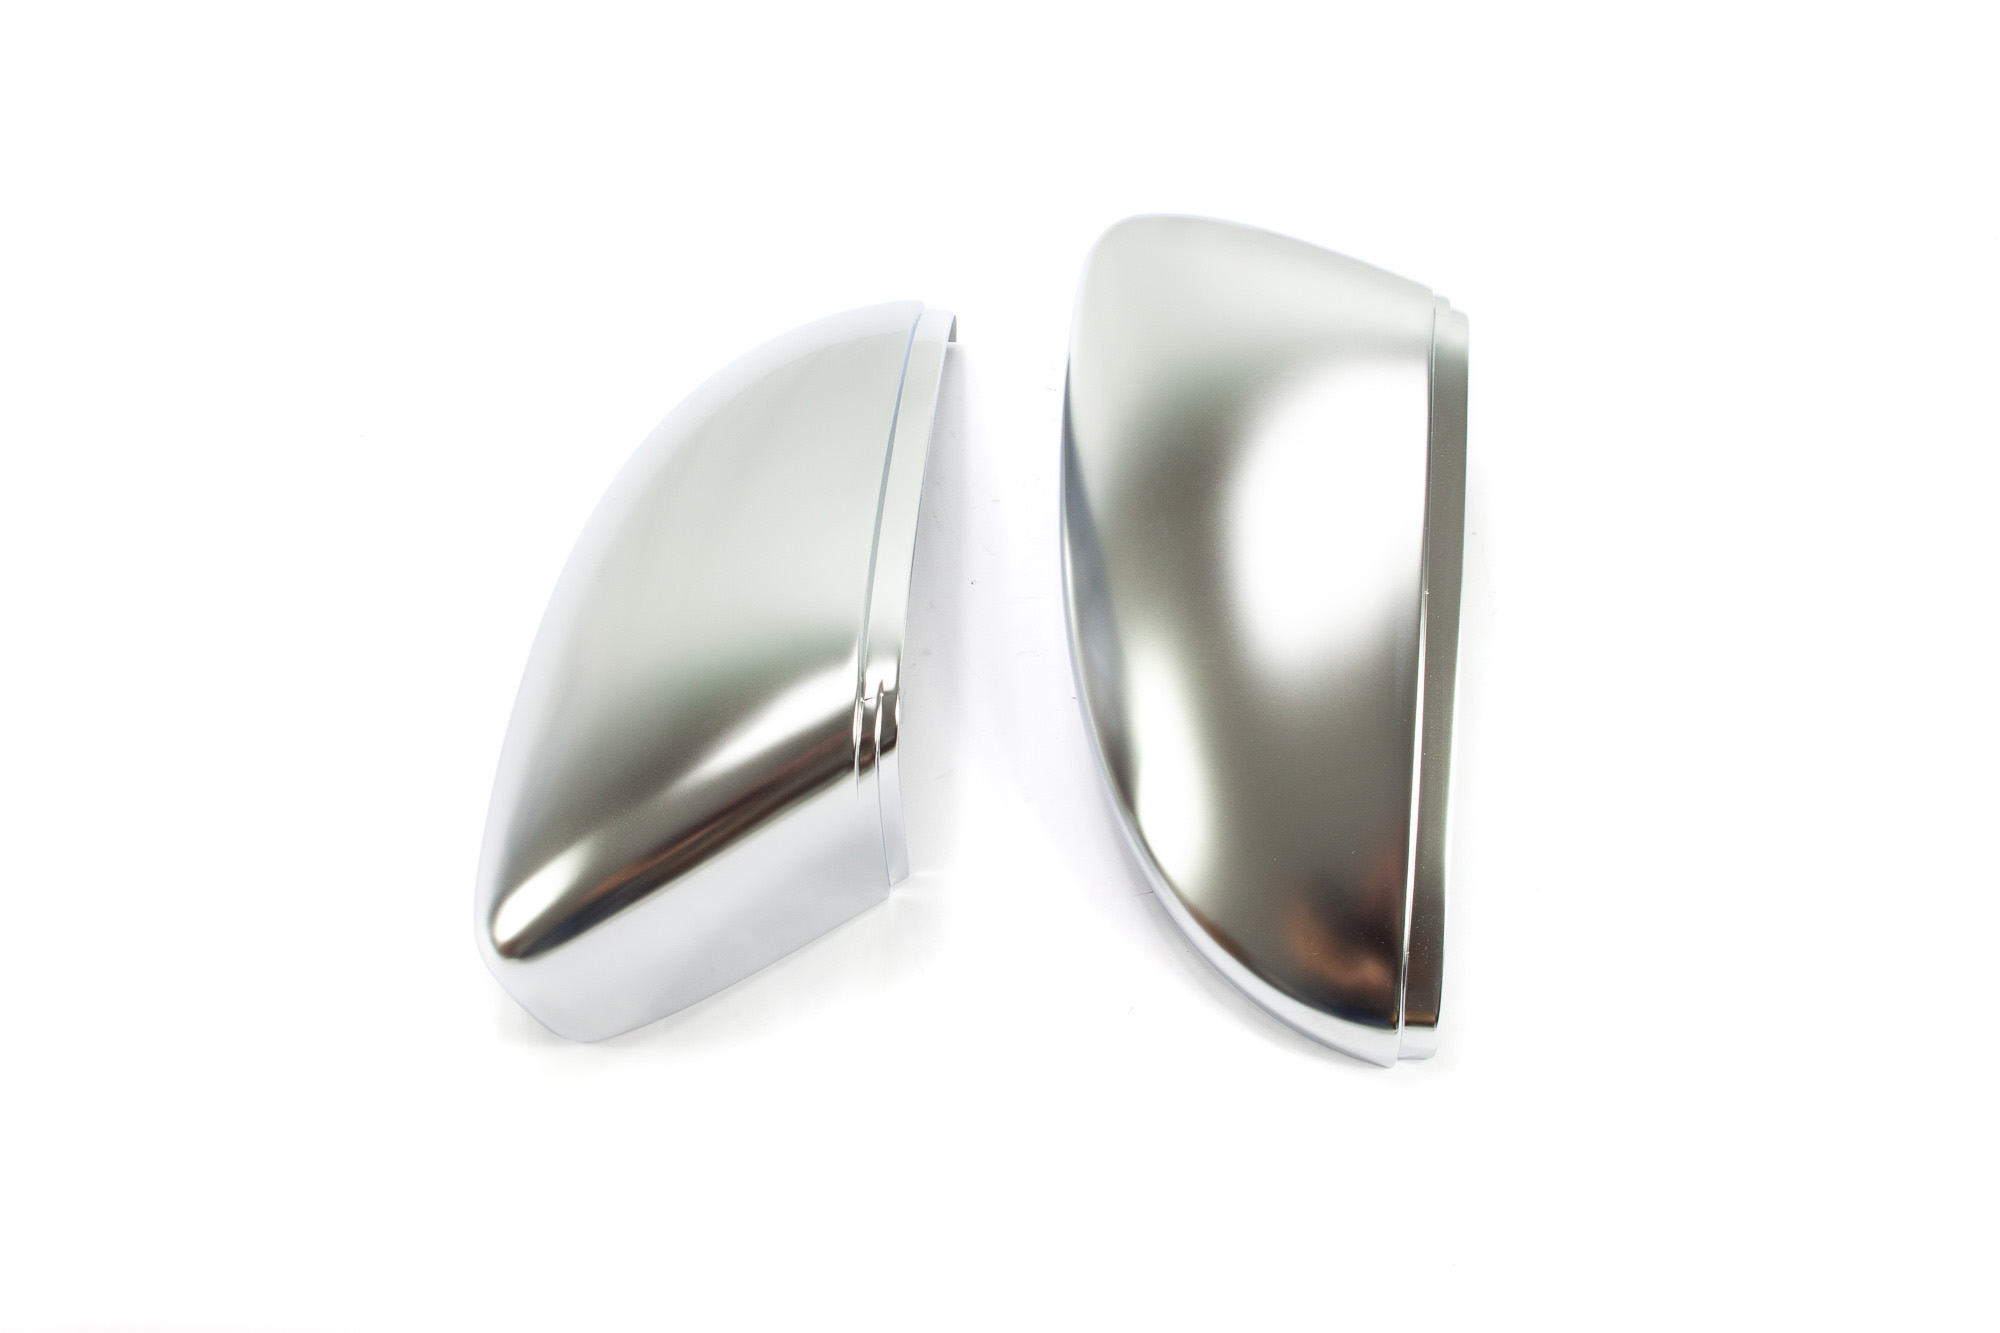 Aluminium Style Spiegelkappen - VW CC, Passat, Scirocco